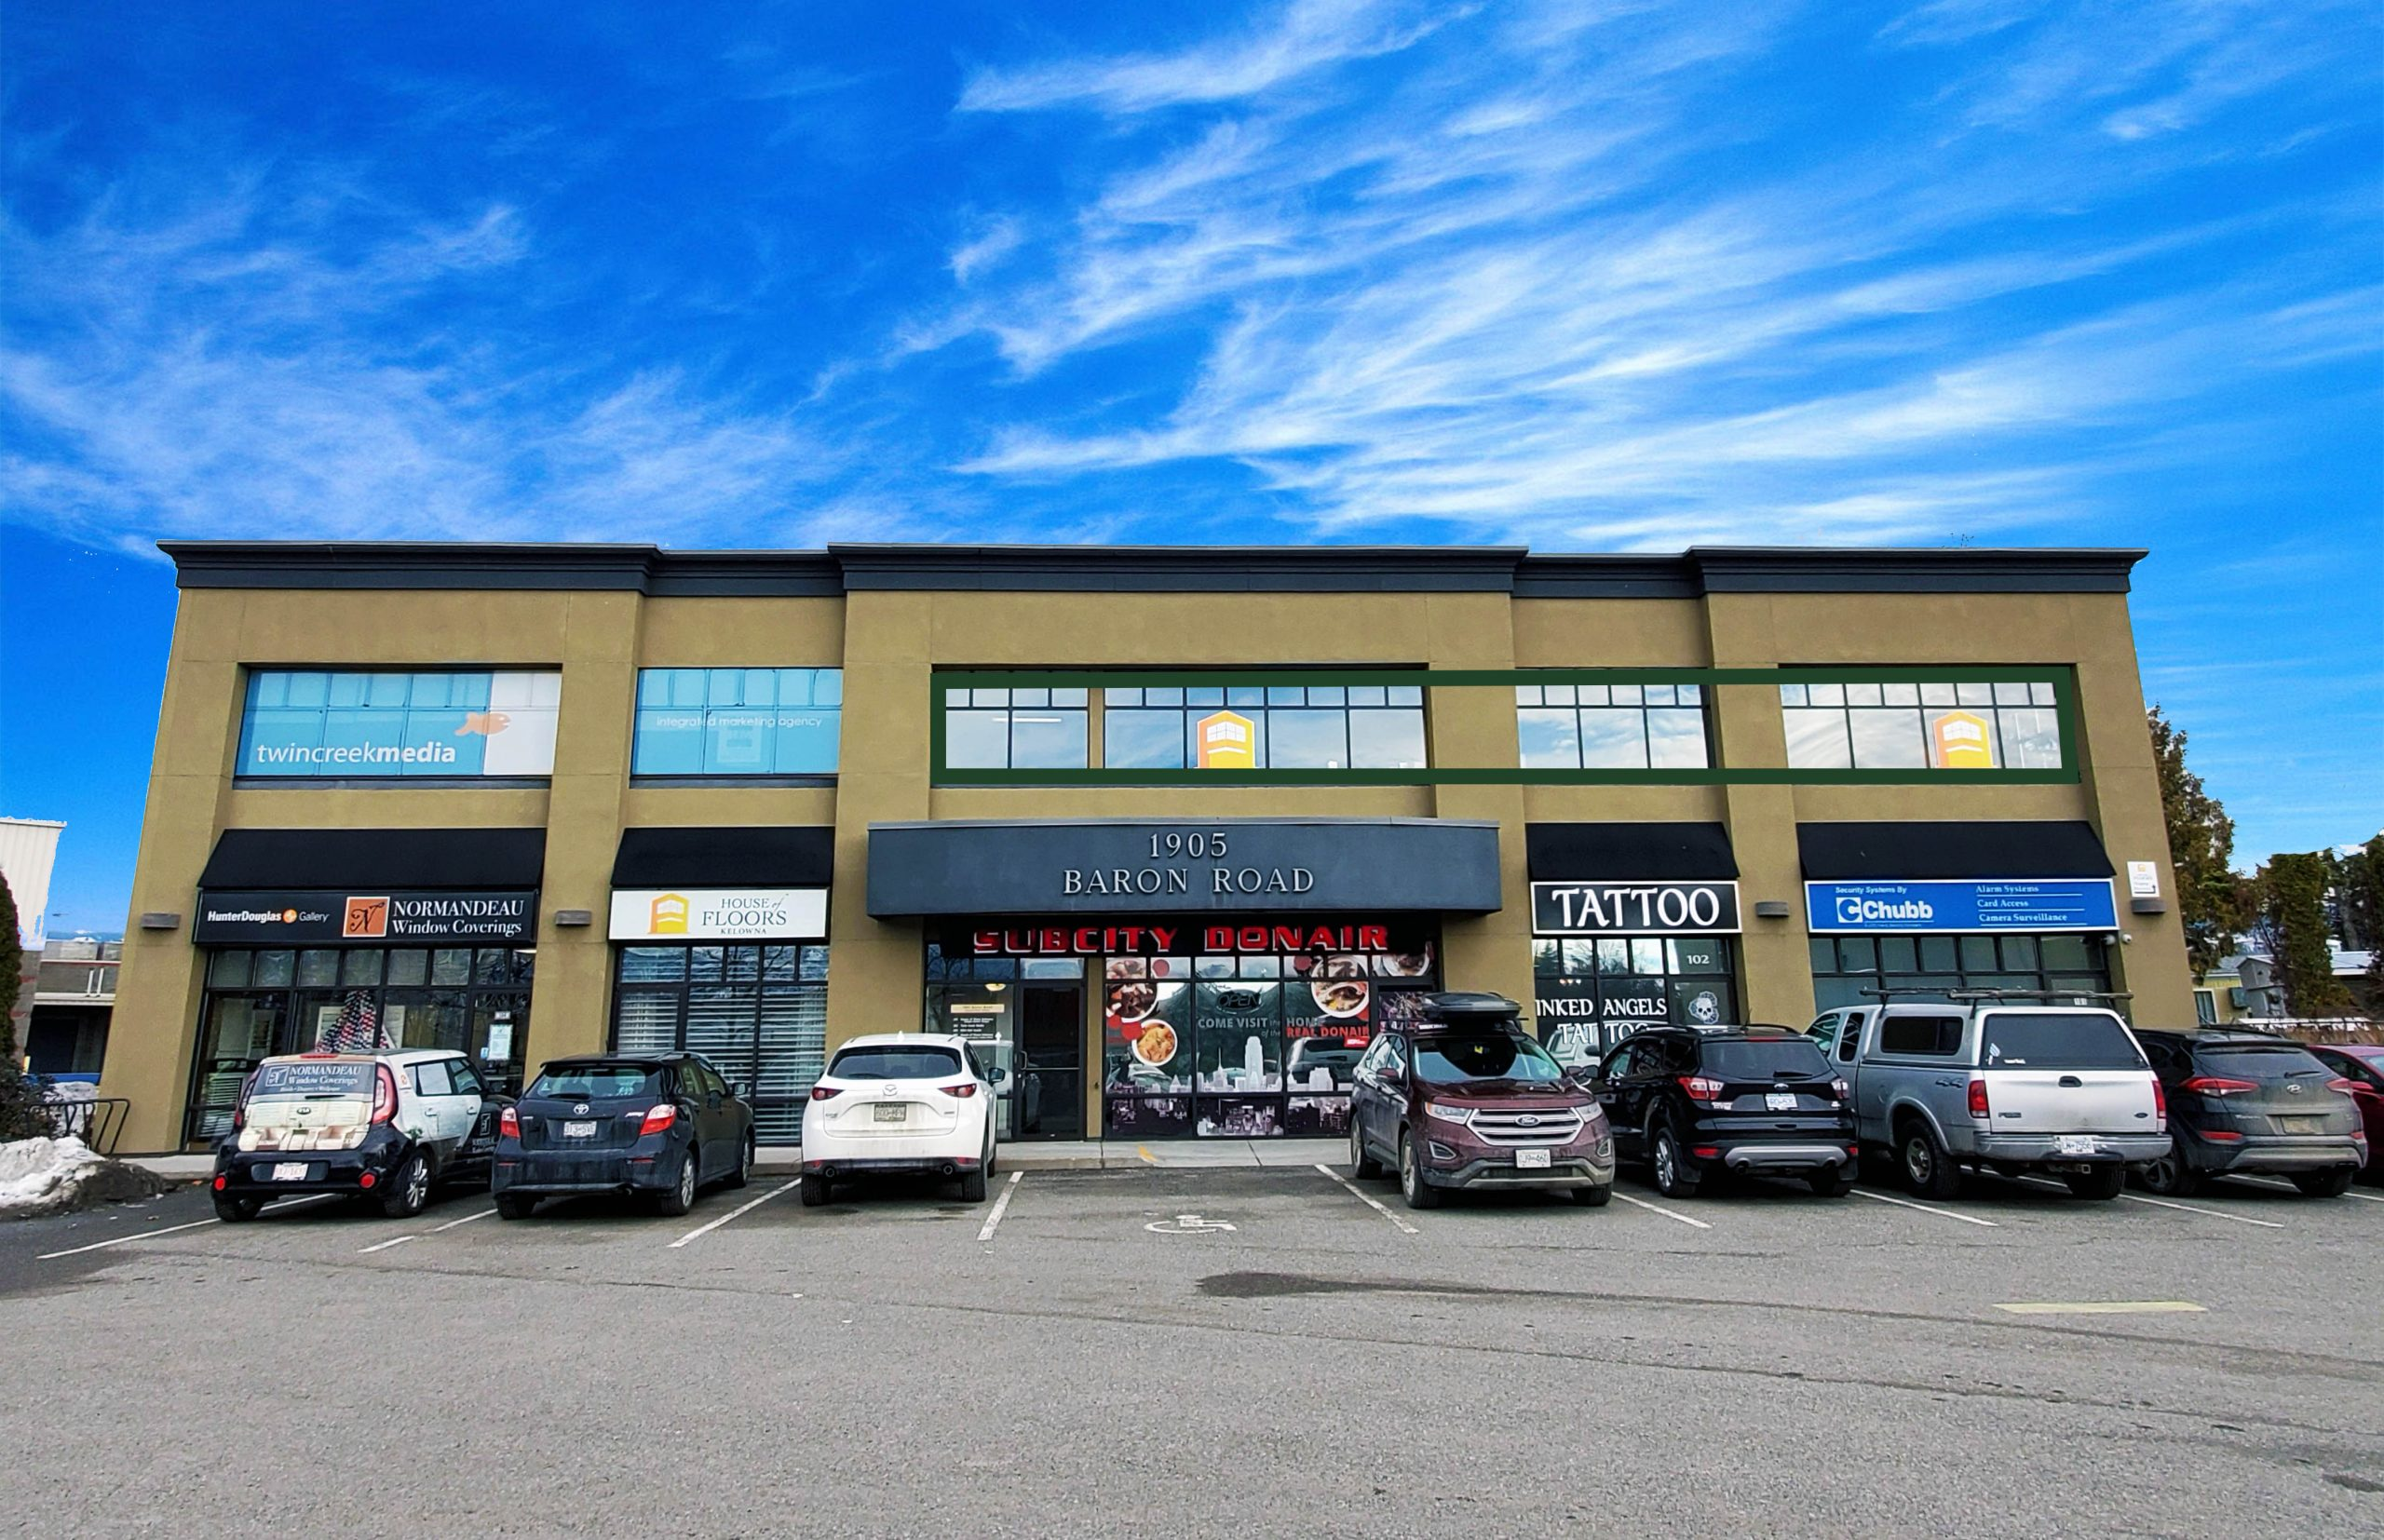 #201-1905 Baron Road, Kelowna, BC - High Visibility Office Space in Central Kelowna